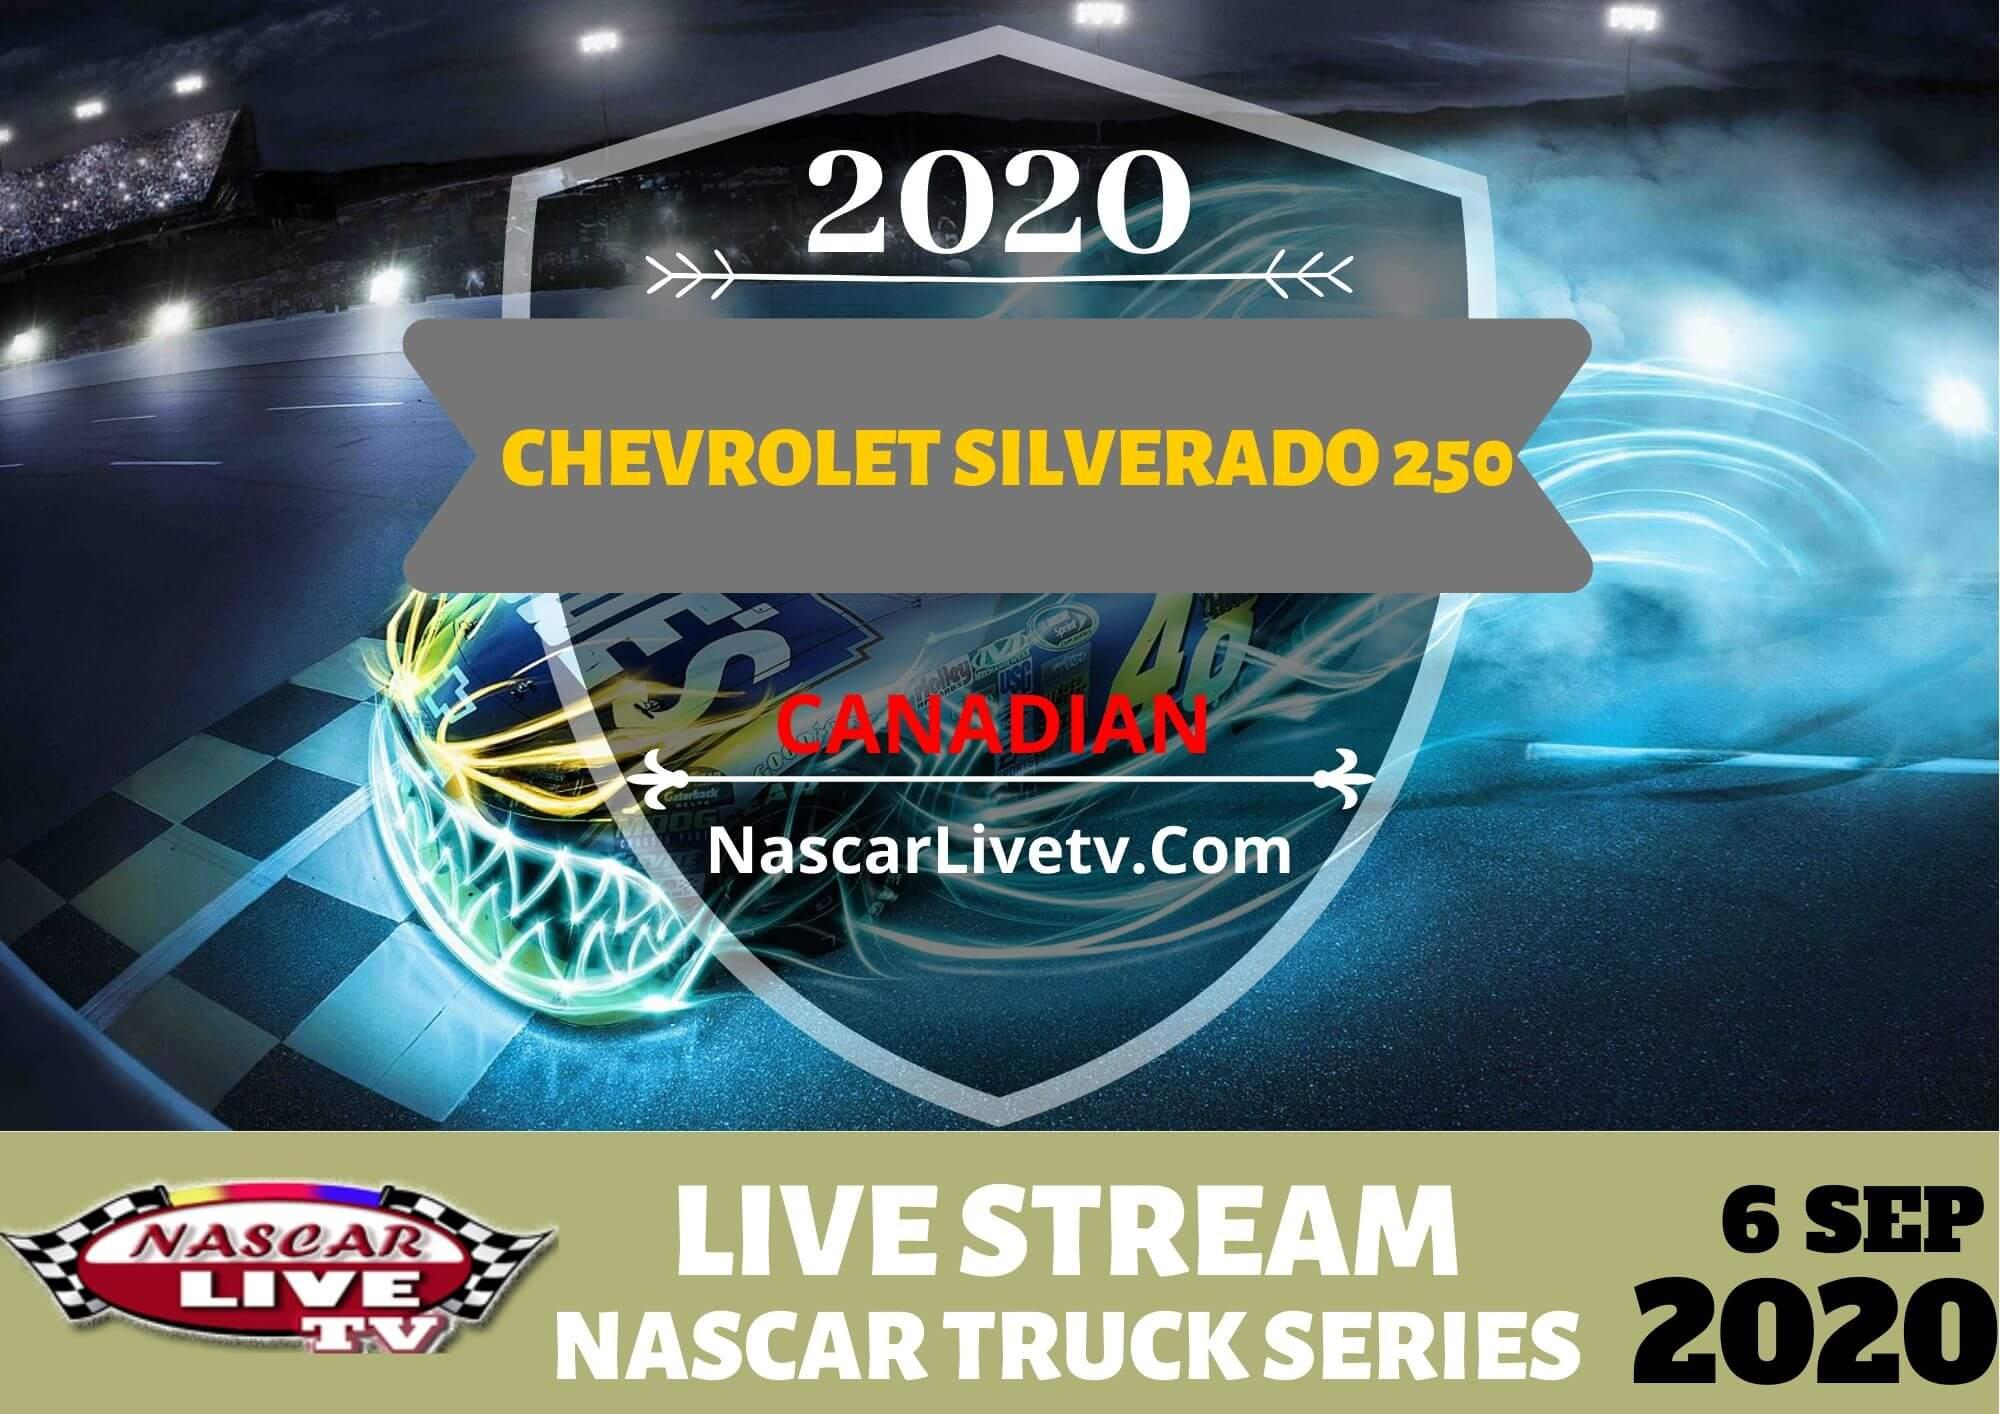 NGOTS Chevrolet Silverado 250 Live Stream 2020